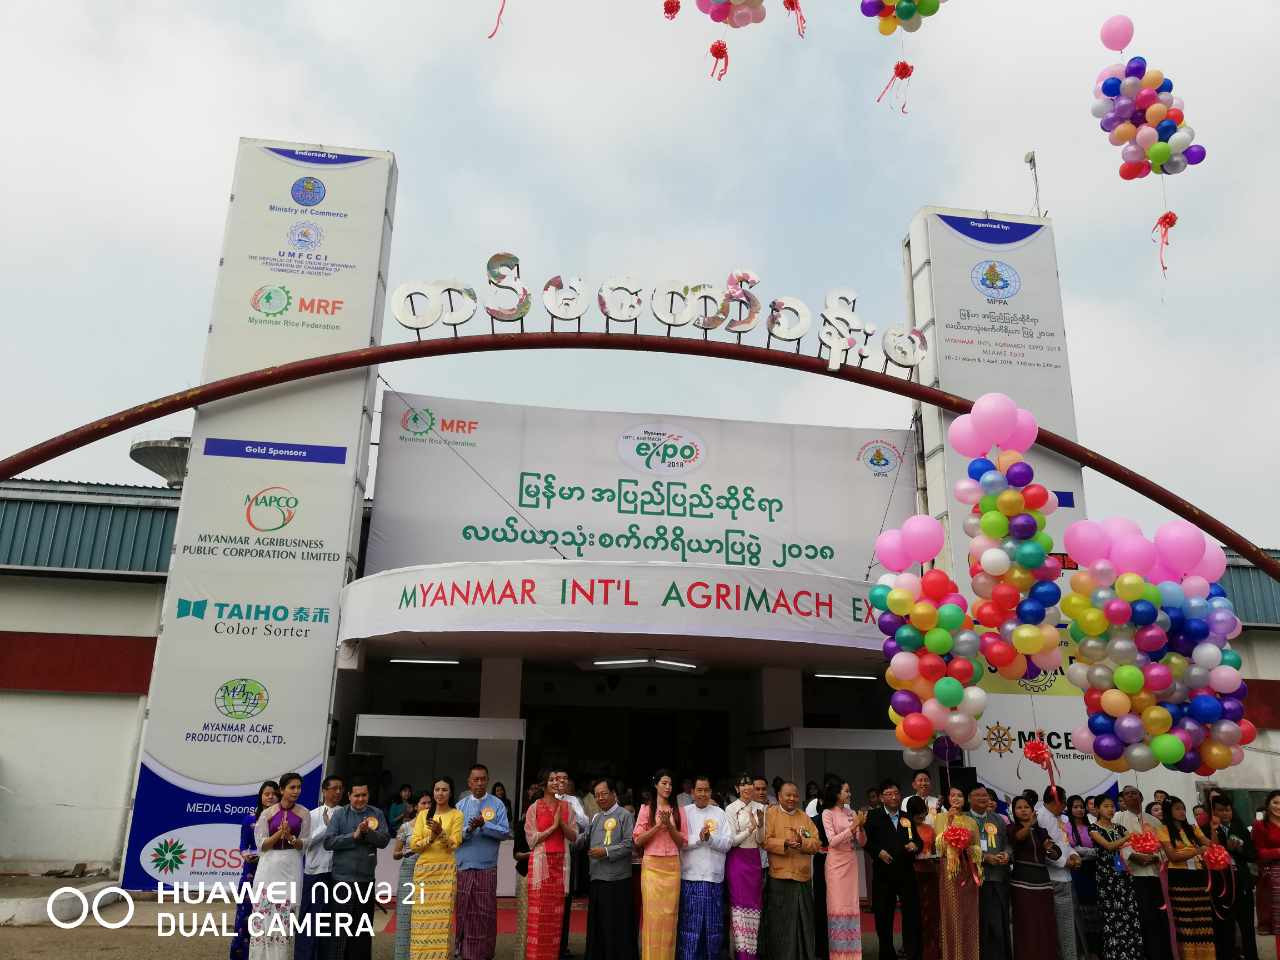 MYANMAR INT'L AGRIMACH EXPO 2018.jpg